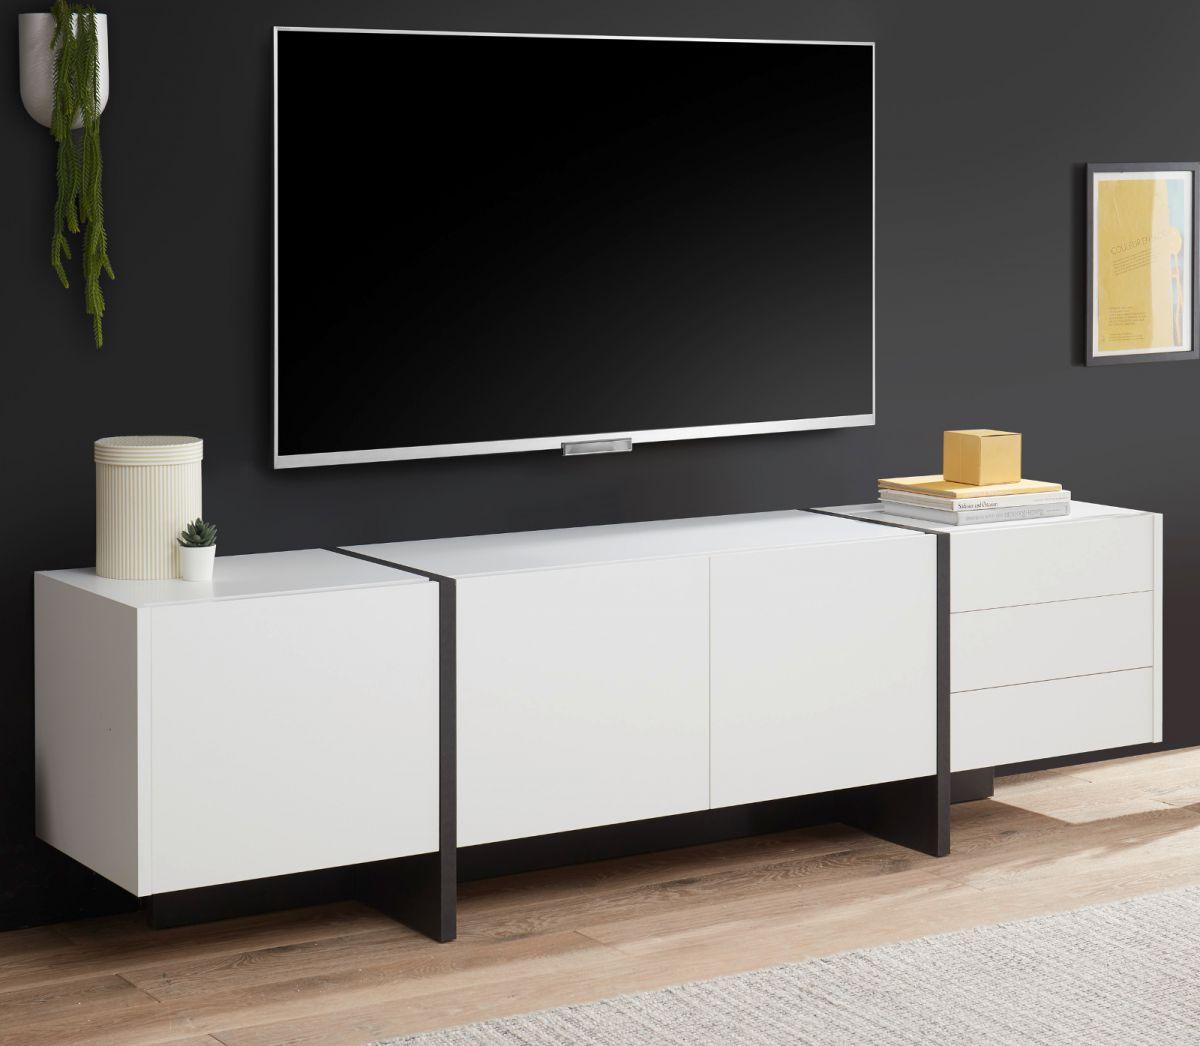 TV-Lowboard Design-M in weiss matt und Fresco grau 210 x 60 cm